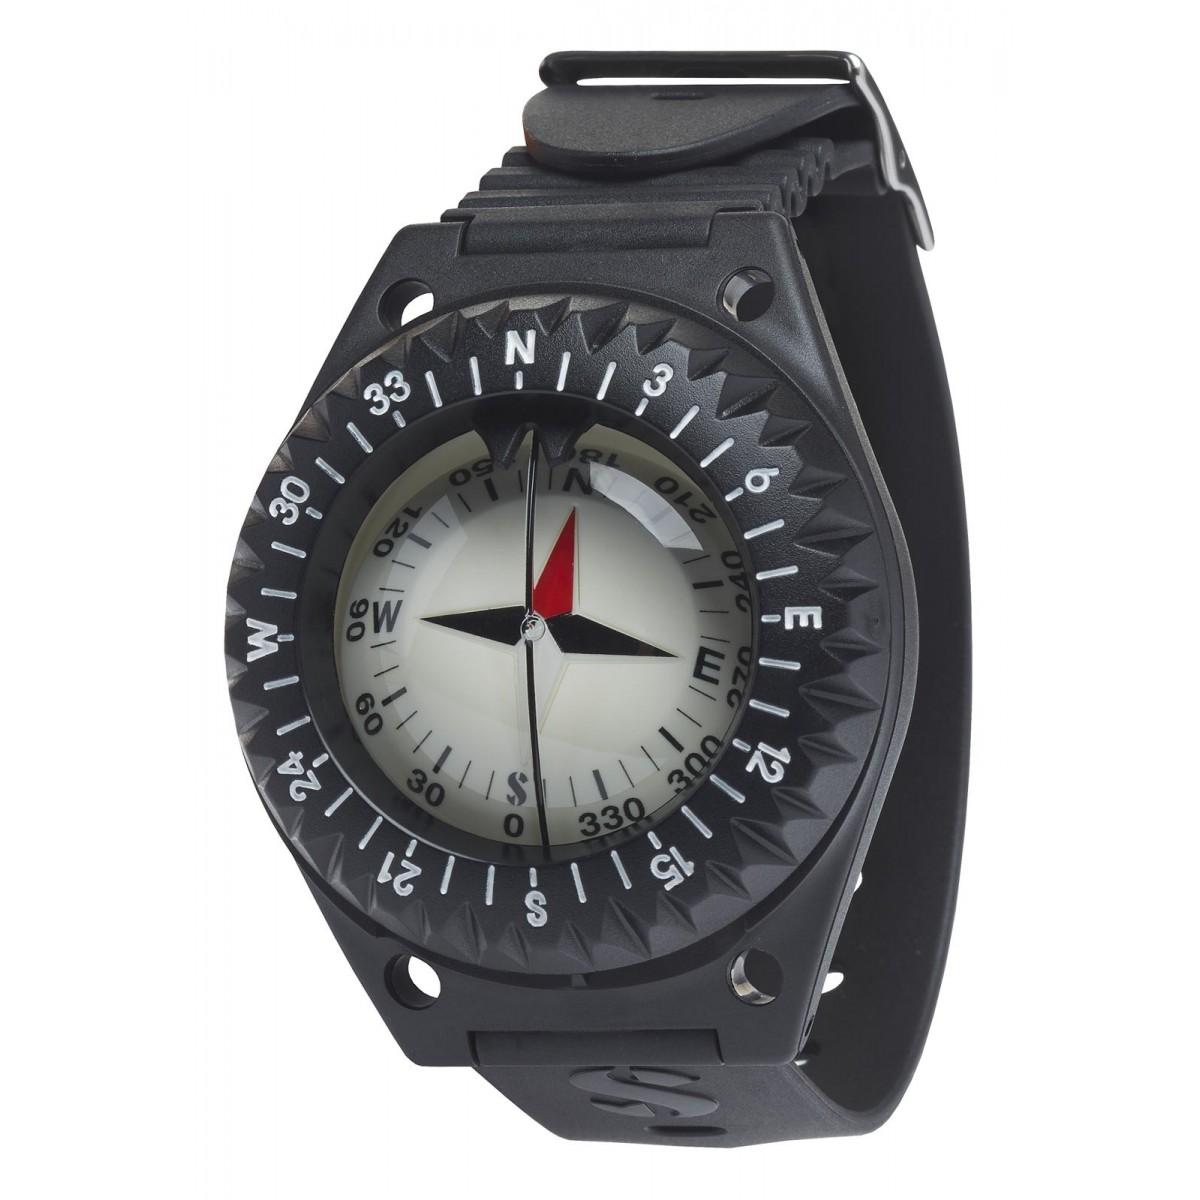 Scubapro FS 1.5 Compass